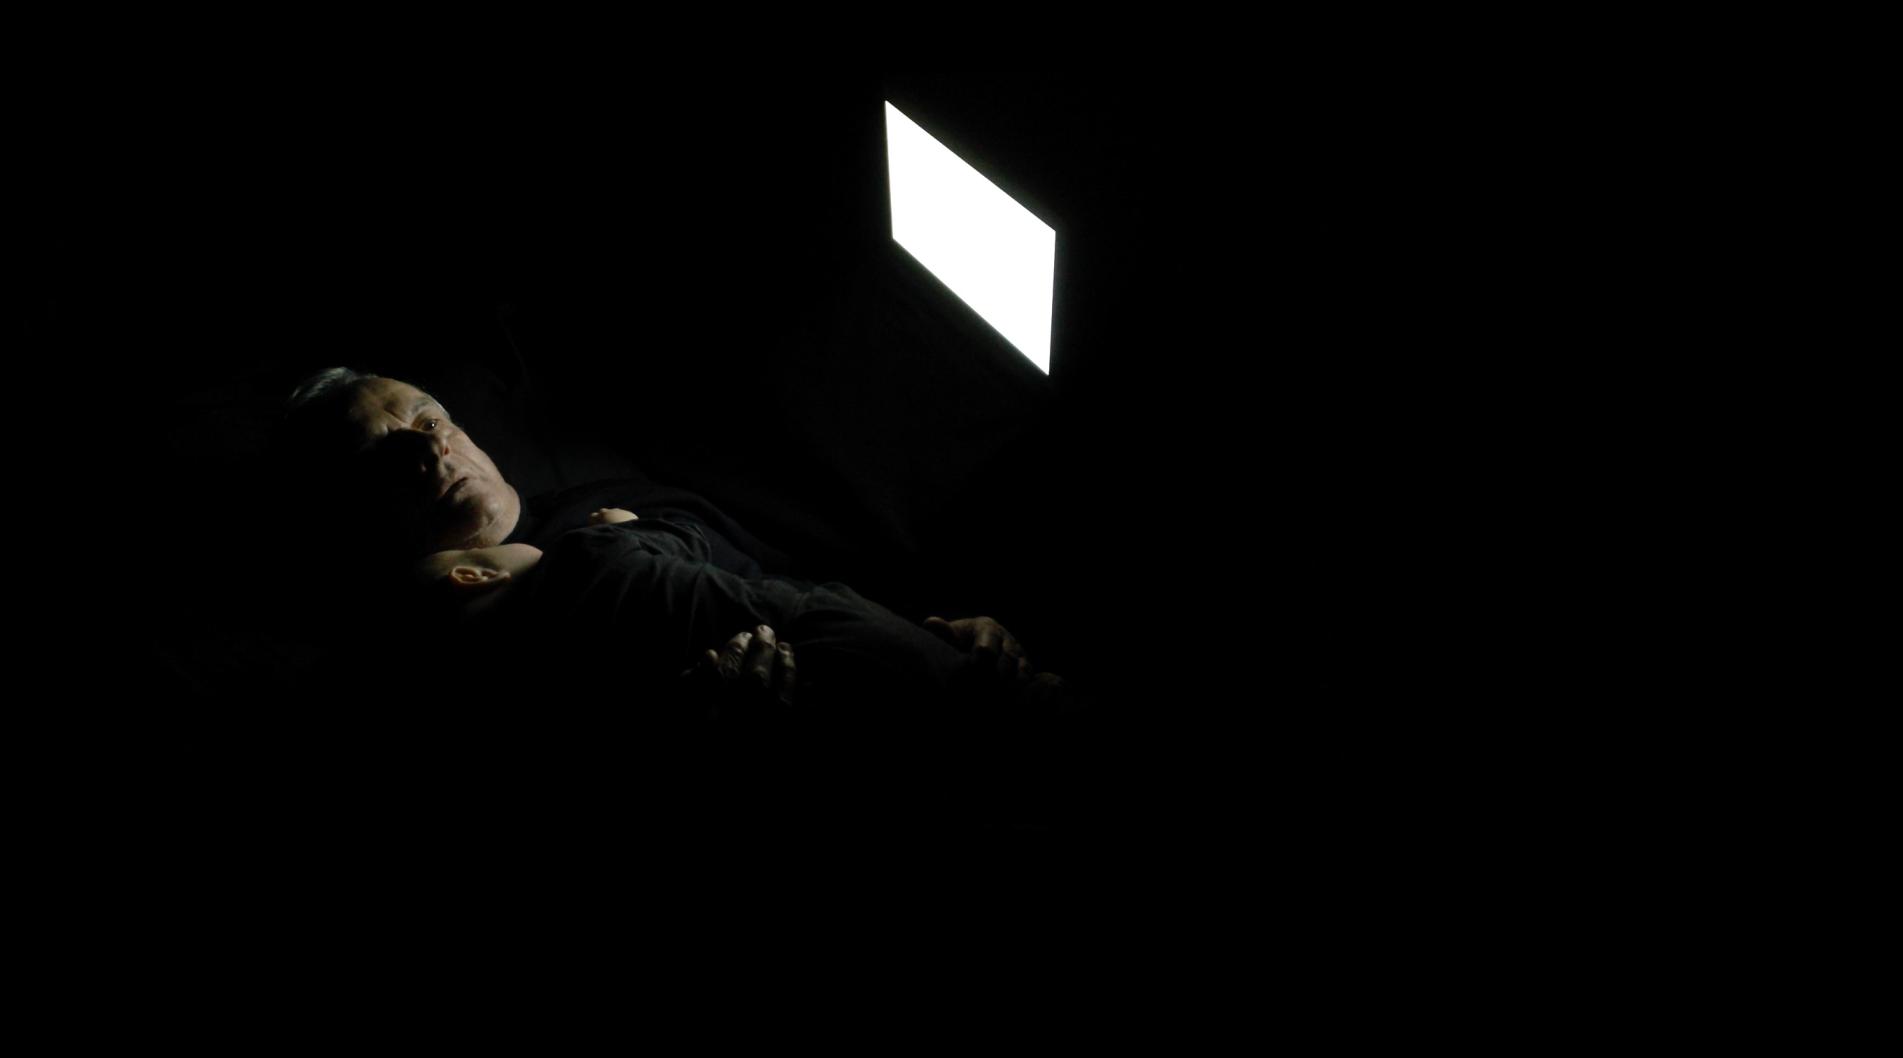 Carlo Zanni, Koh-i-N∞r, 2014, kadr zvideo